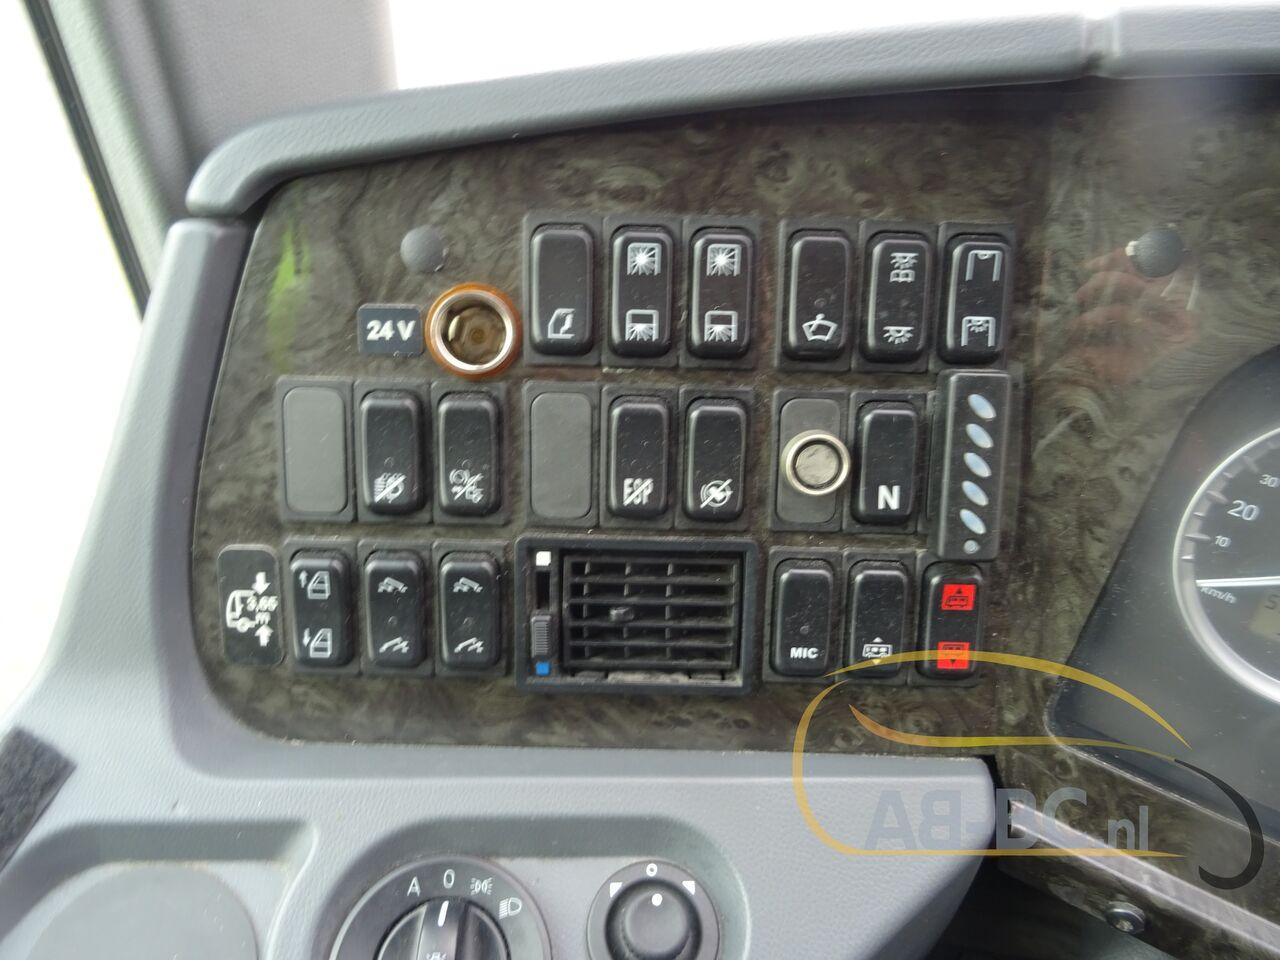 coach-busSETRA-S415-GT-HD-FINAL-EDITION---1627457123013863662_big_50641507e6fd183089085e86633cbe6f--21050713010665719300